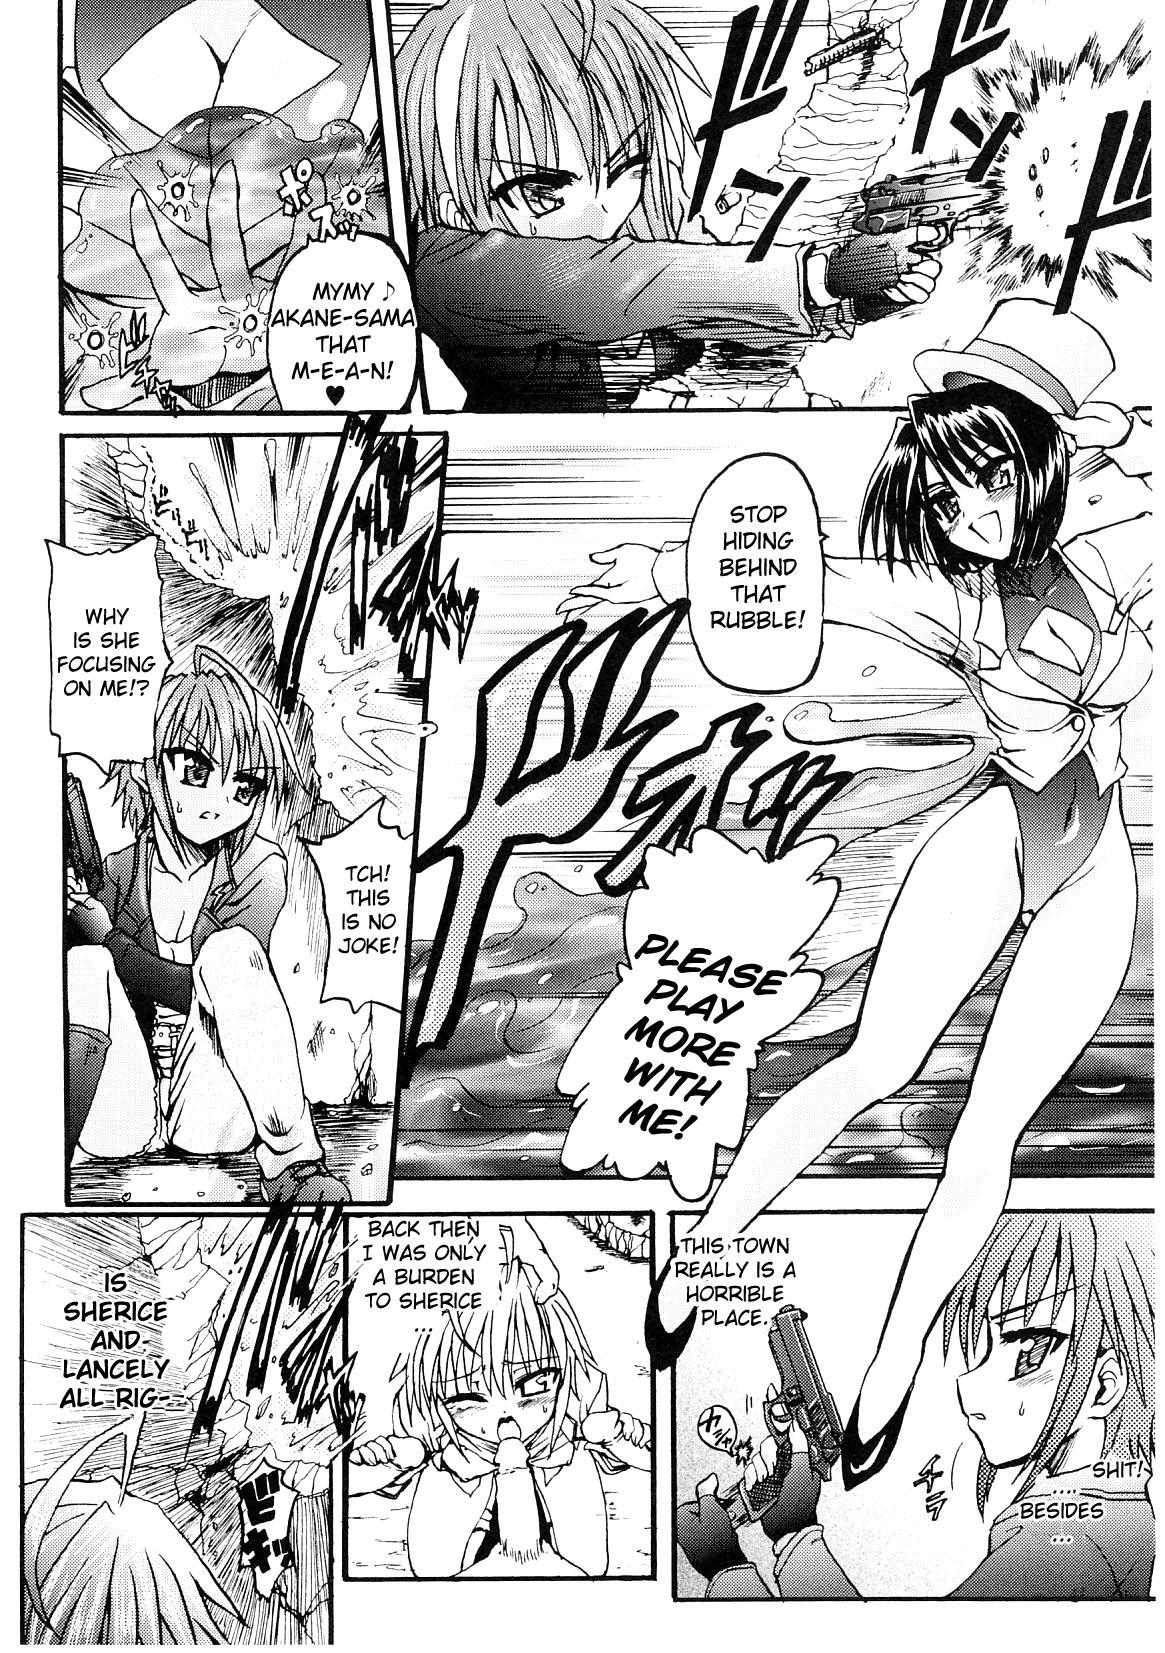 [Rougan] Ma ga Ochiru Yoru (The Night When Evil Falls) - Demonic Imitator Ch. 01-05 [ENG] 5